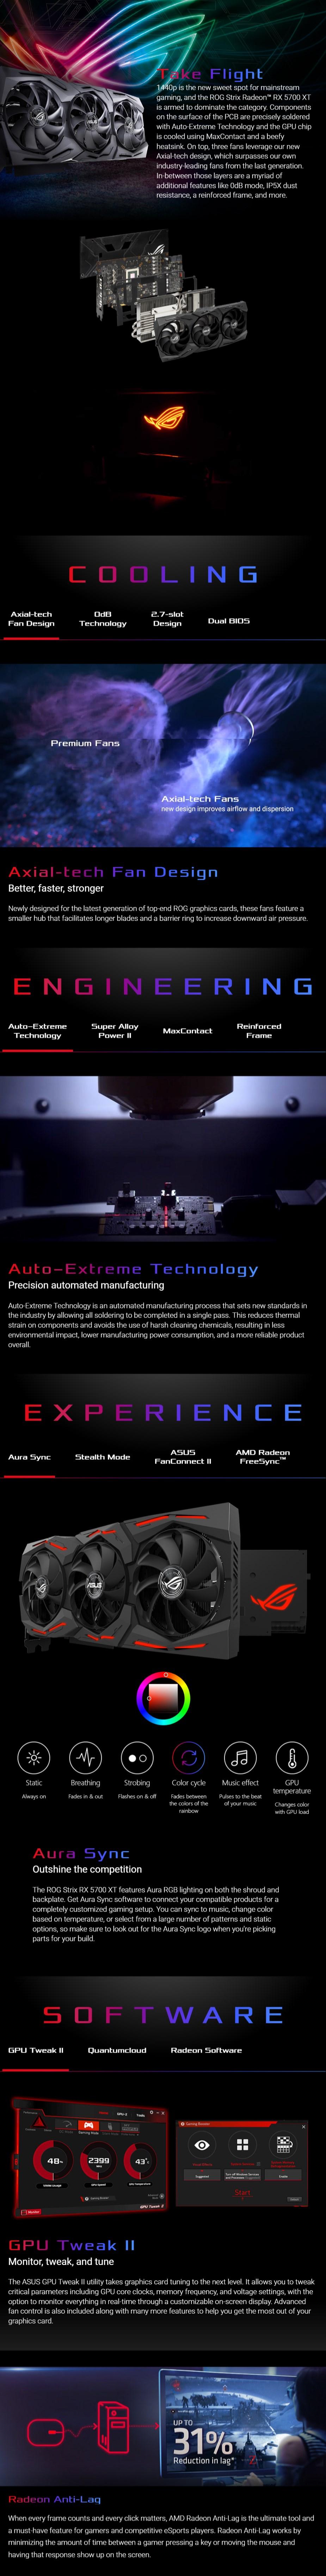 ASUS Radeon RX 5700 XT ROG Strix OC 8GB Video Card - Overview 1